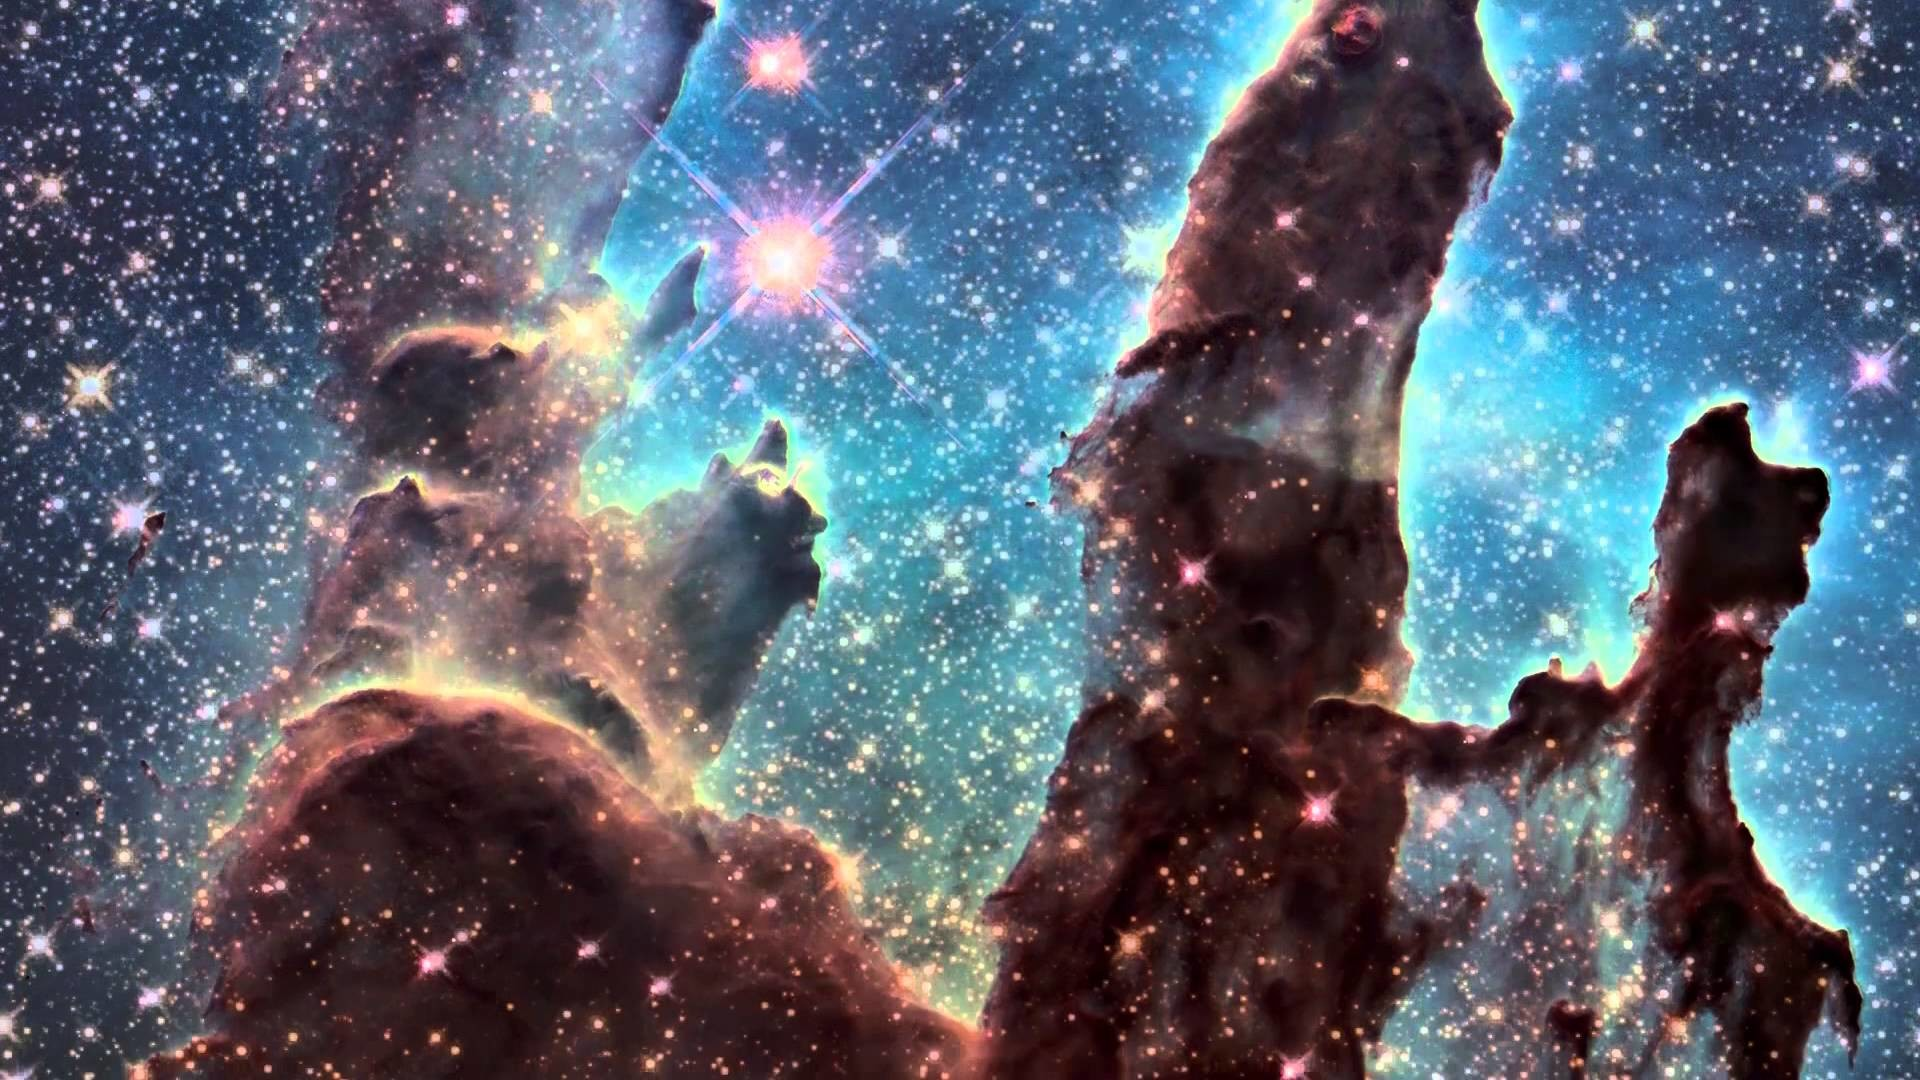 Pillars Of Creation Wallpaper Hd: Hubble Wallpaper 1080p (63+ Images